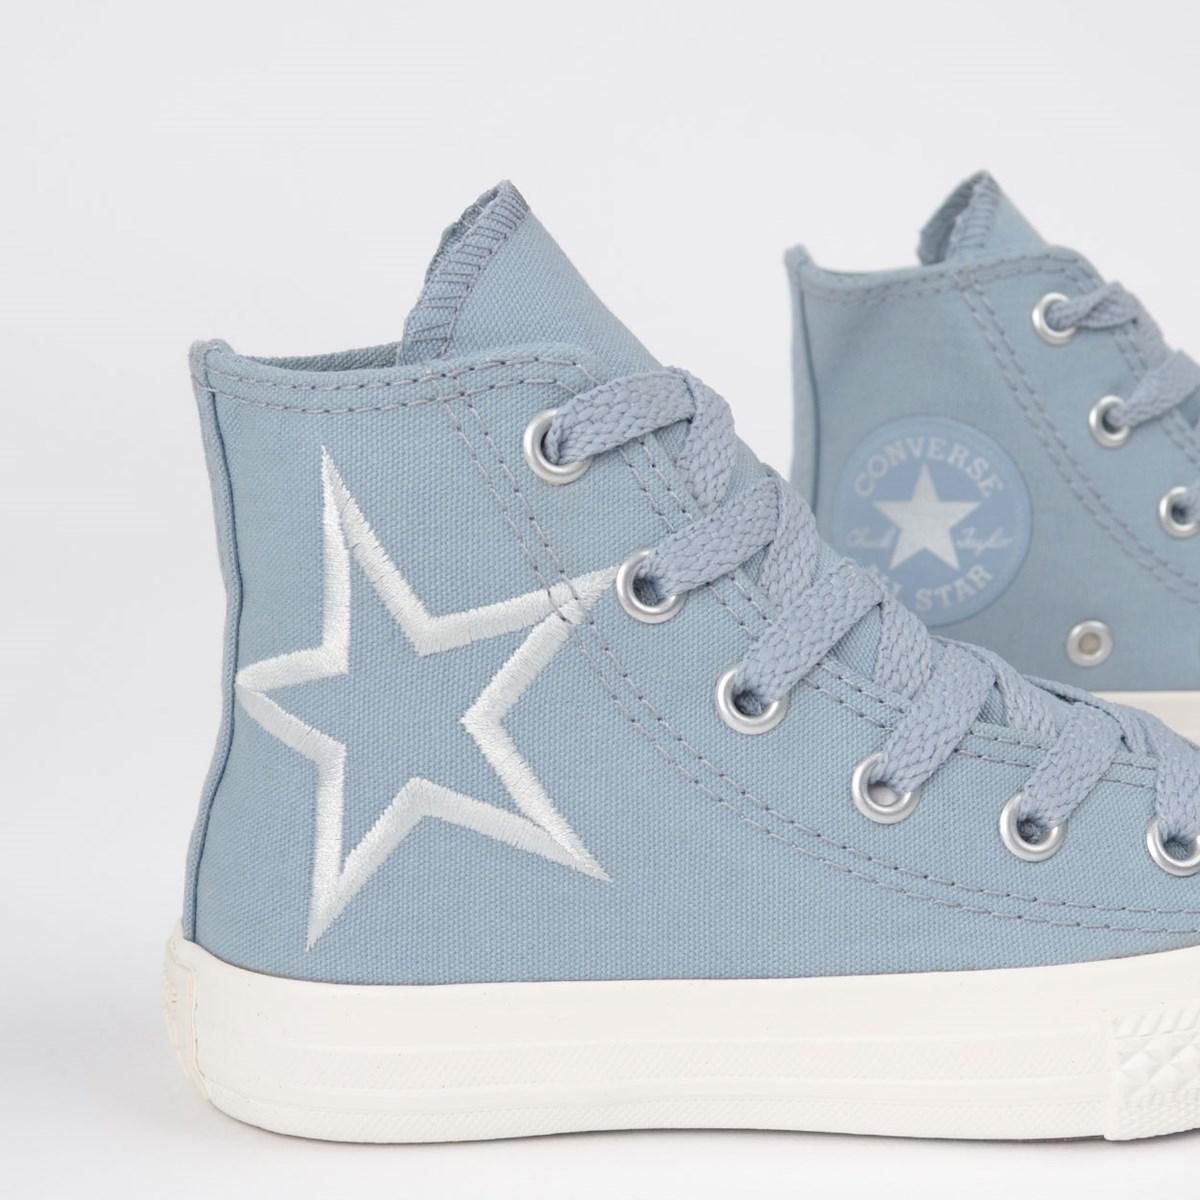 Tênis Converse Chuck Taylor All Star Kids Hi Azul Indigo Prata Puro CK08160002